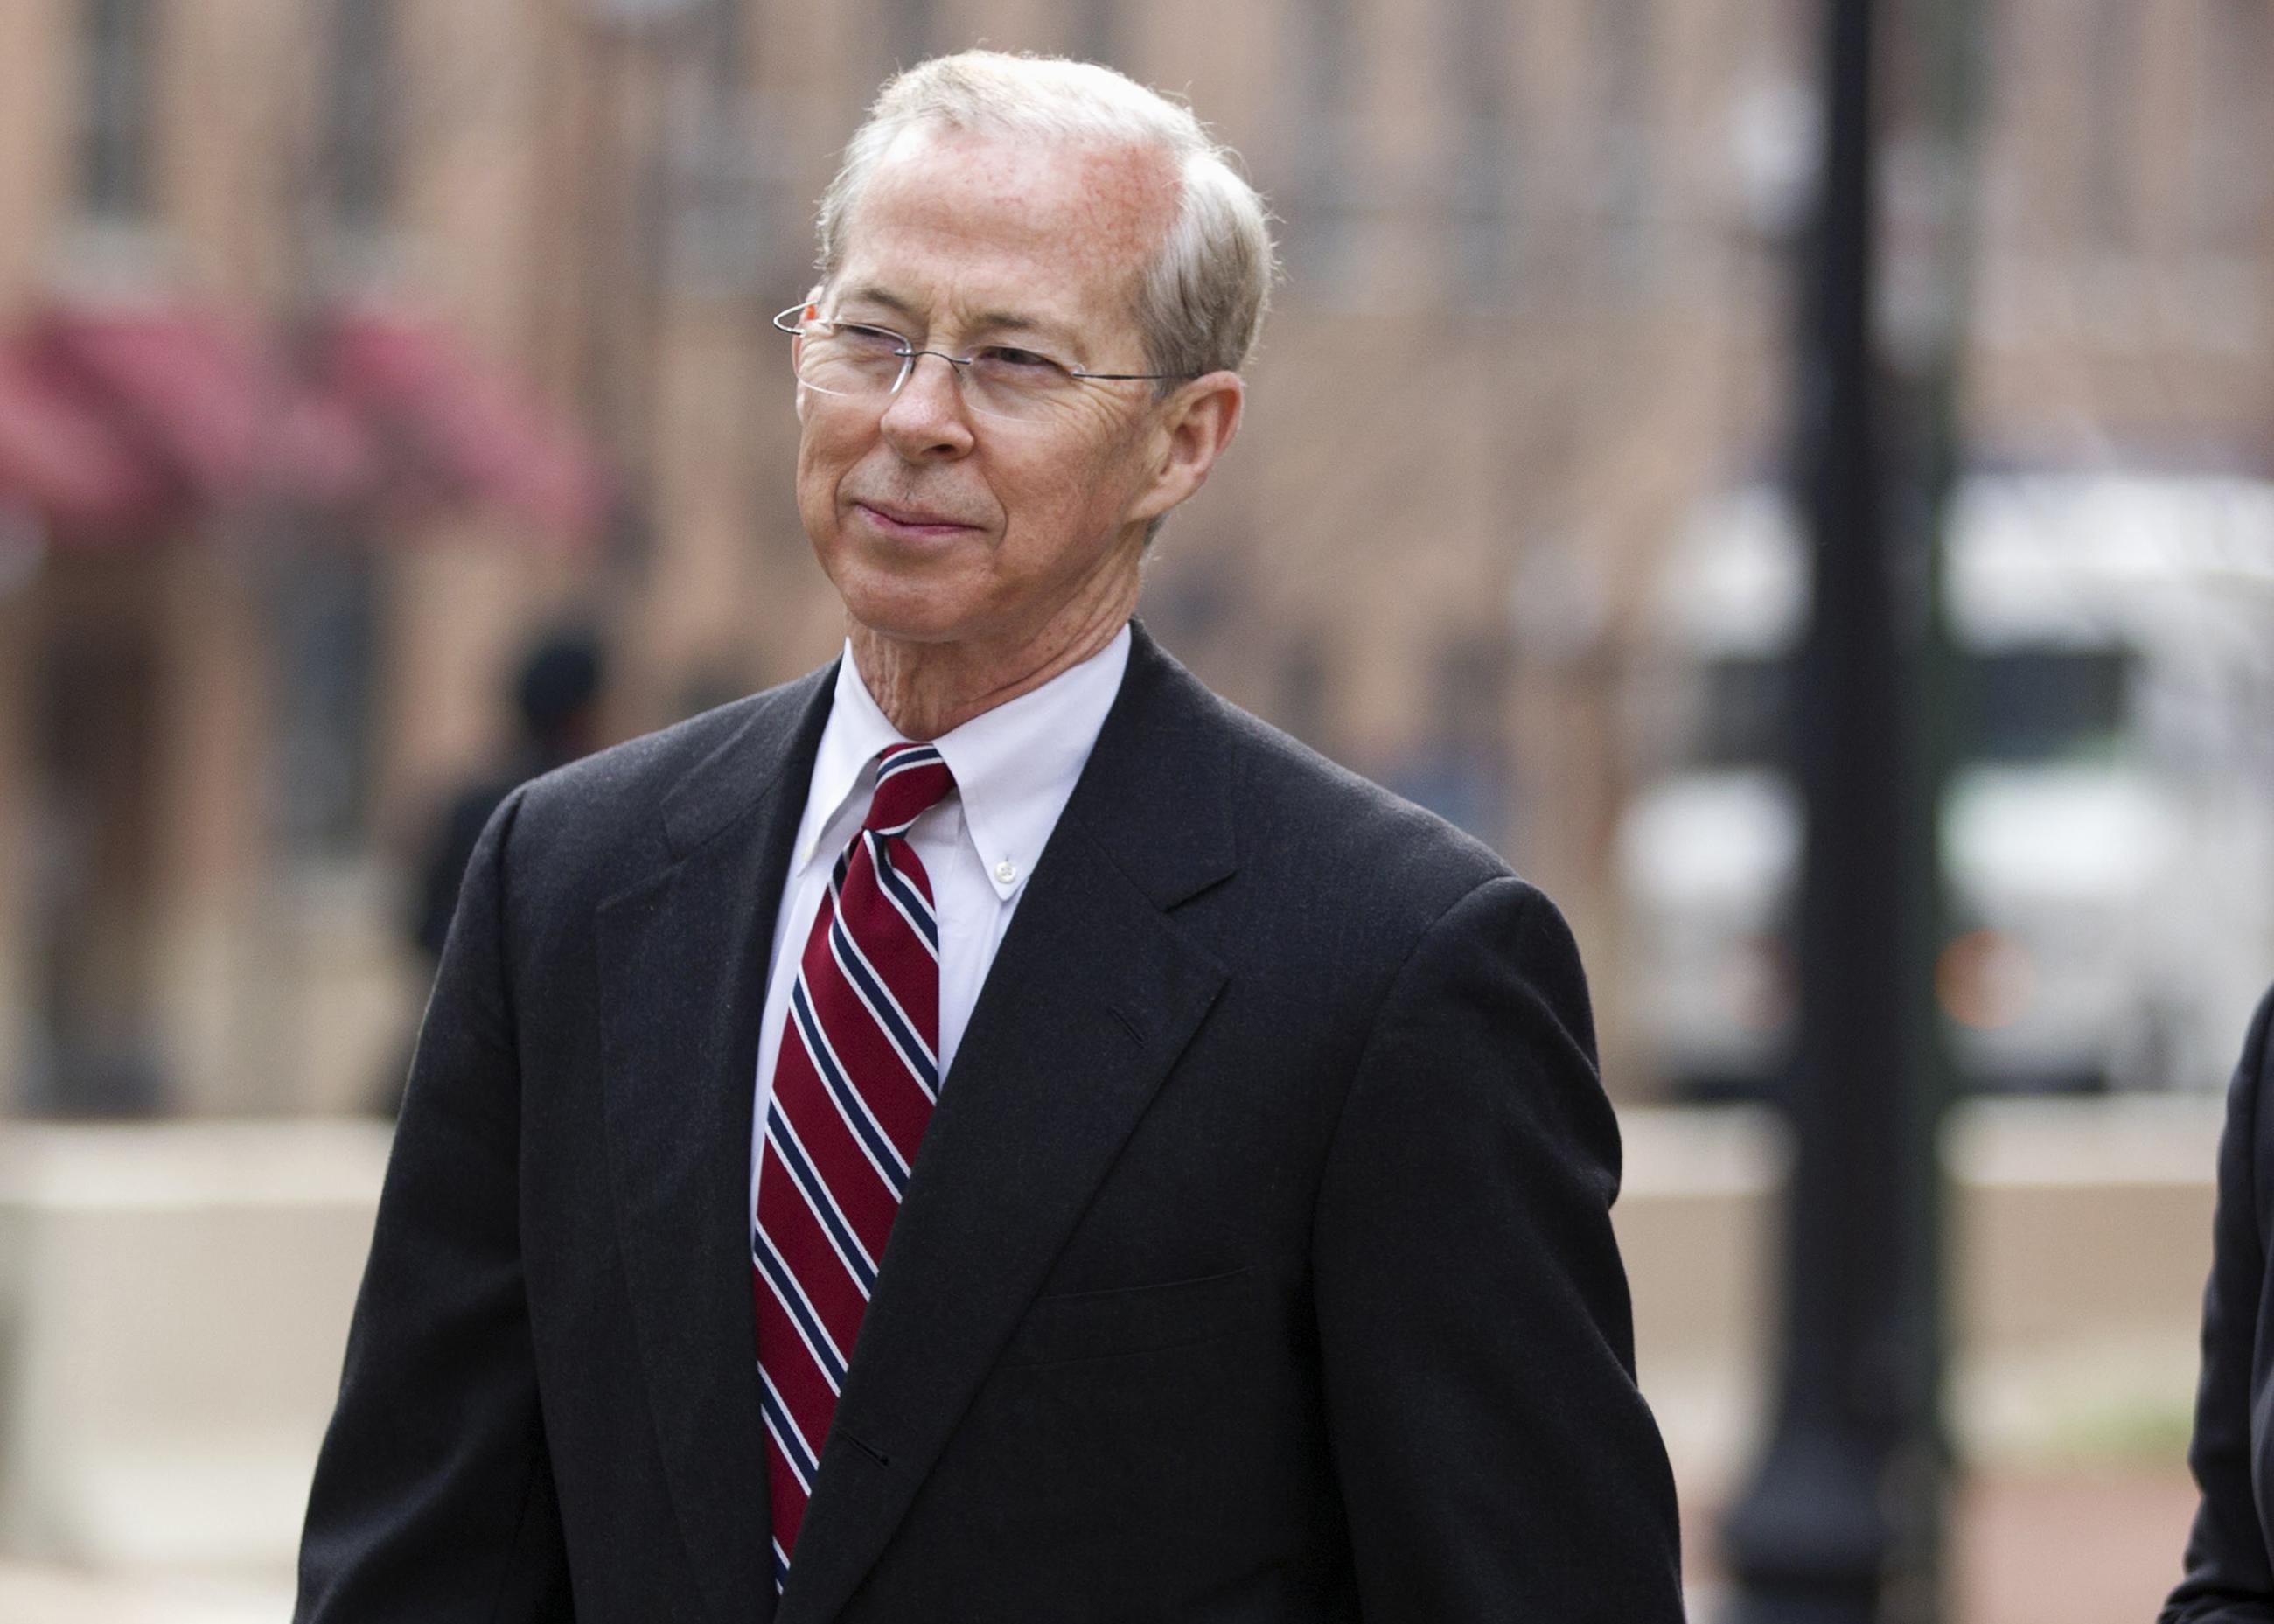 Democrats Watch Trump Moves on Key Prosecutor Posts